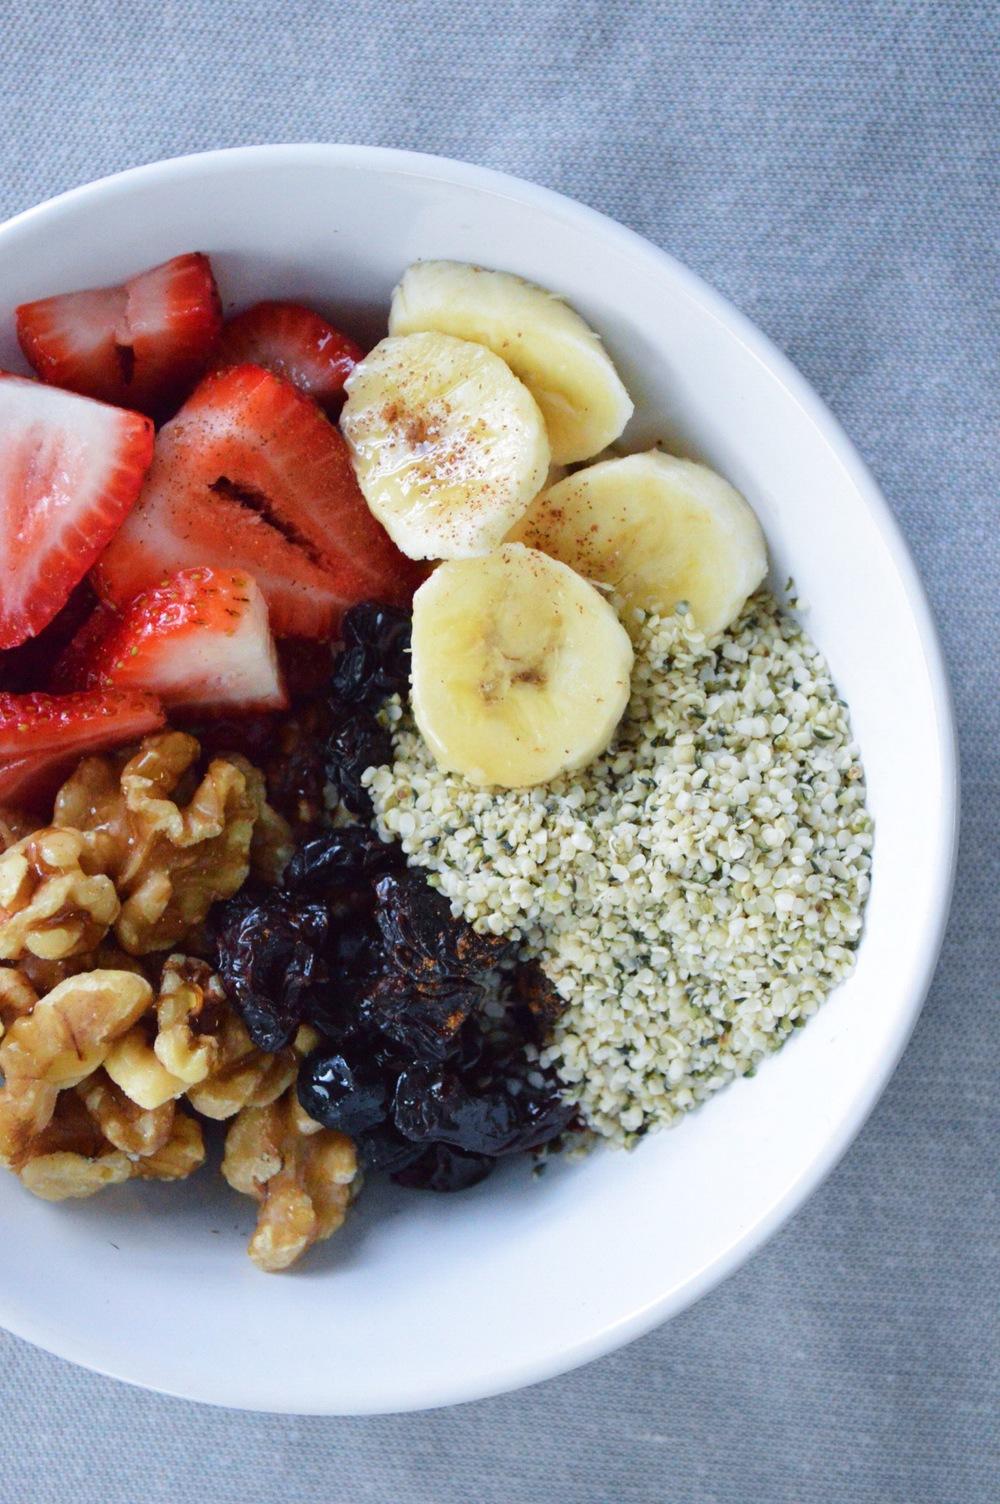 Fresh-Fruit-Superfood-Breakfast-Bowl-LaurenSchwaiger-Blog.jpg